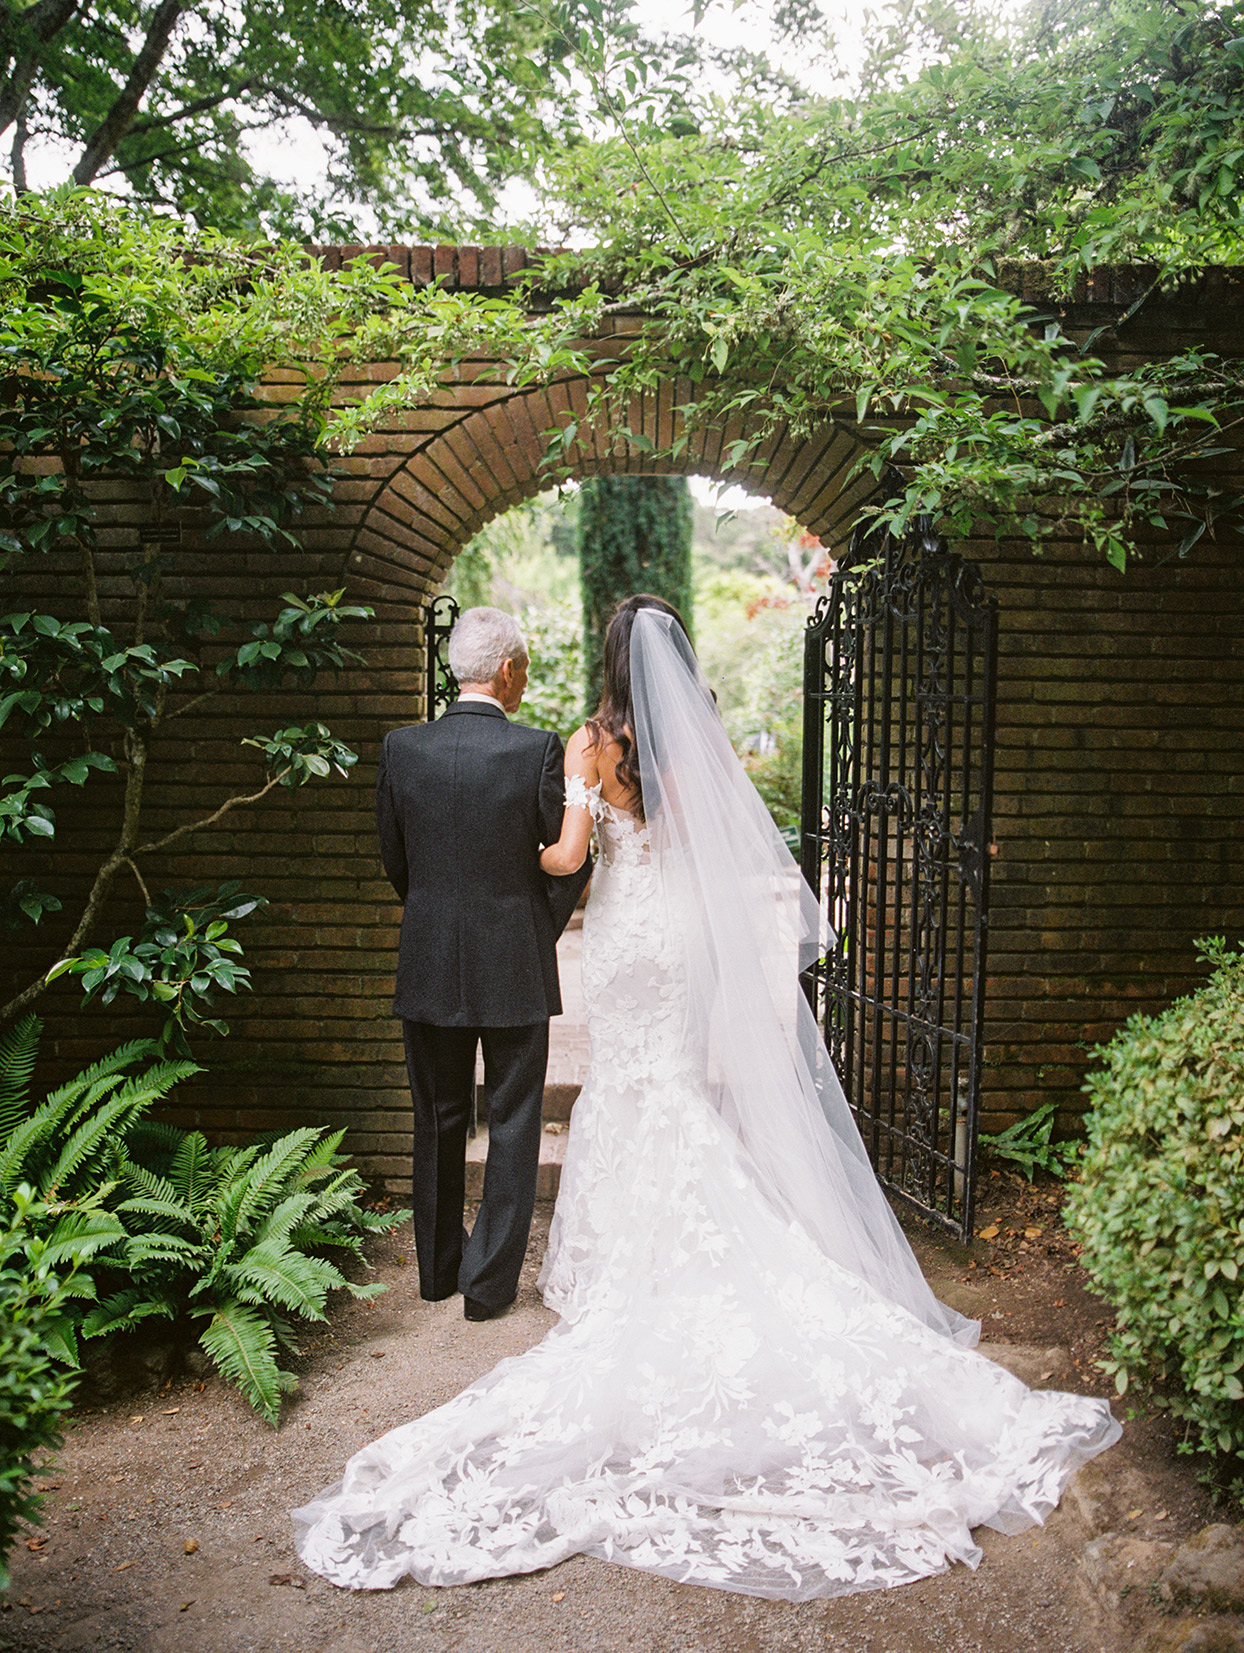 yalda anusha wedding bride and father walking through garden gate